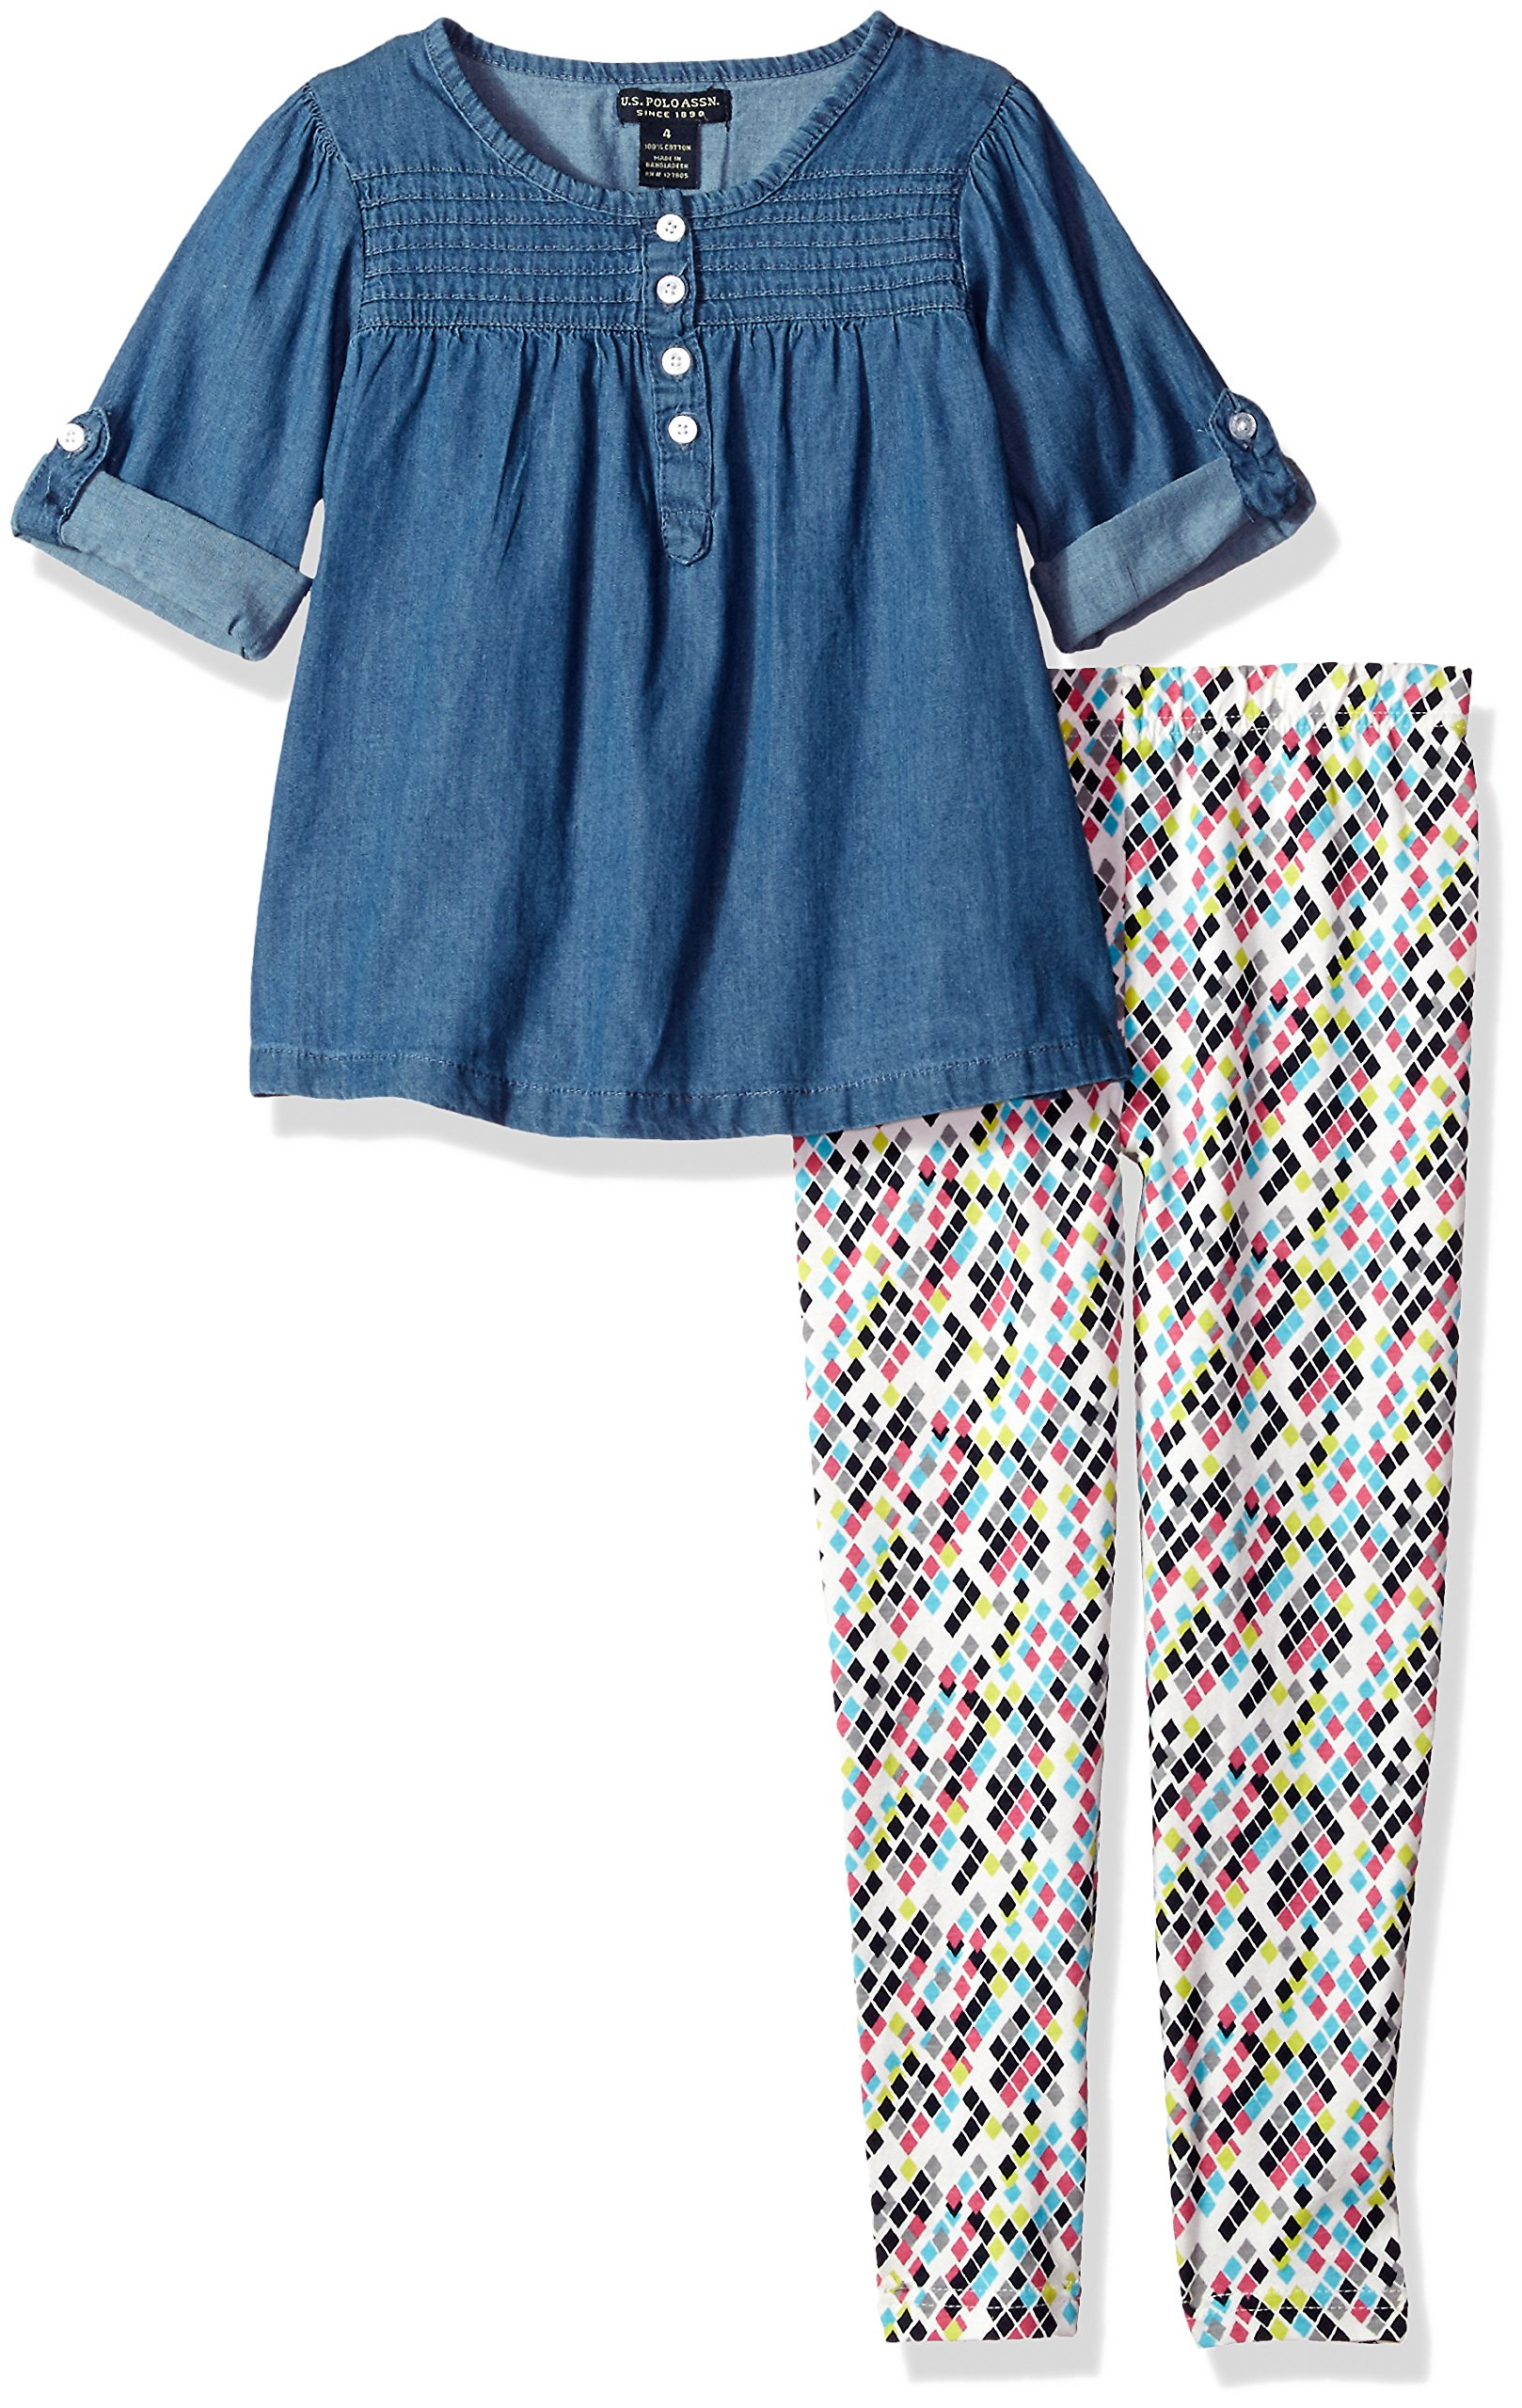 U.S. Polo Assn. Girls' Big Fashion Top and Legging Set, Blue Wash-KZ36, 10 by U.S. Polo Assn. (Image #1)